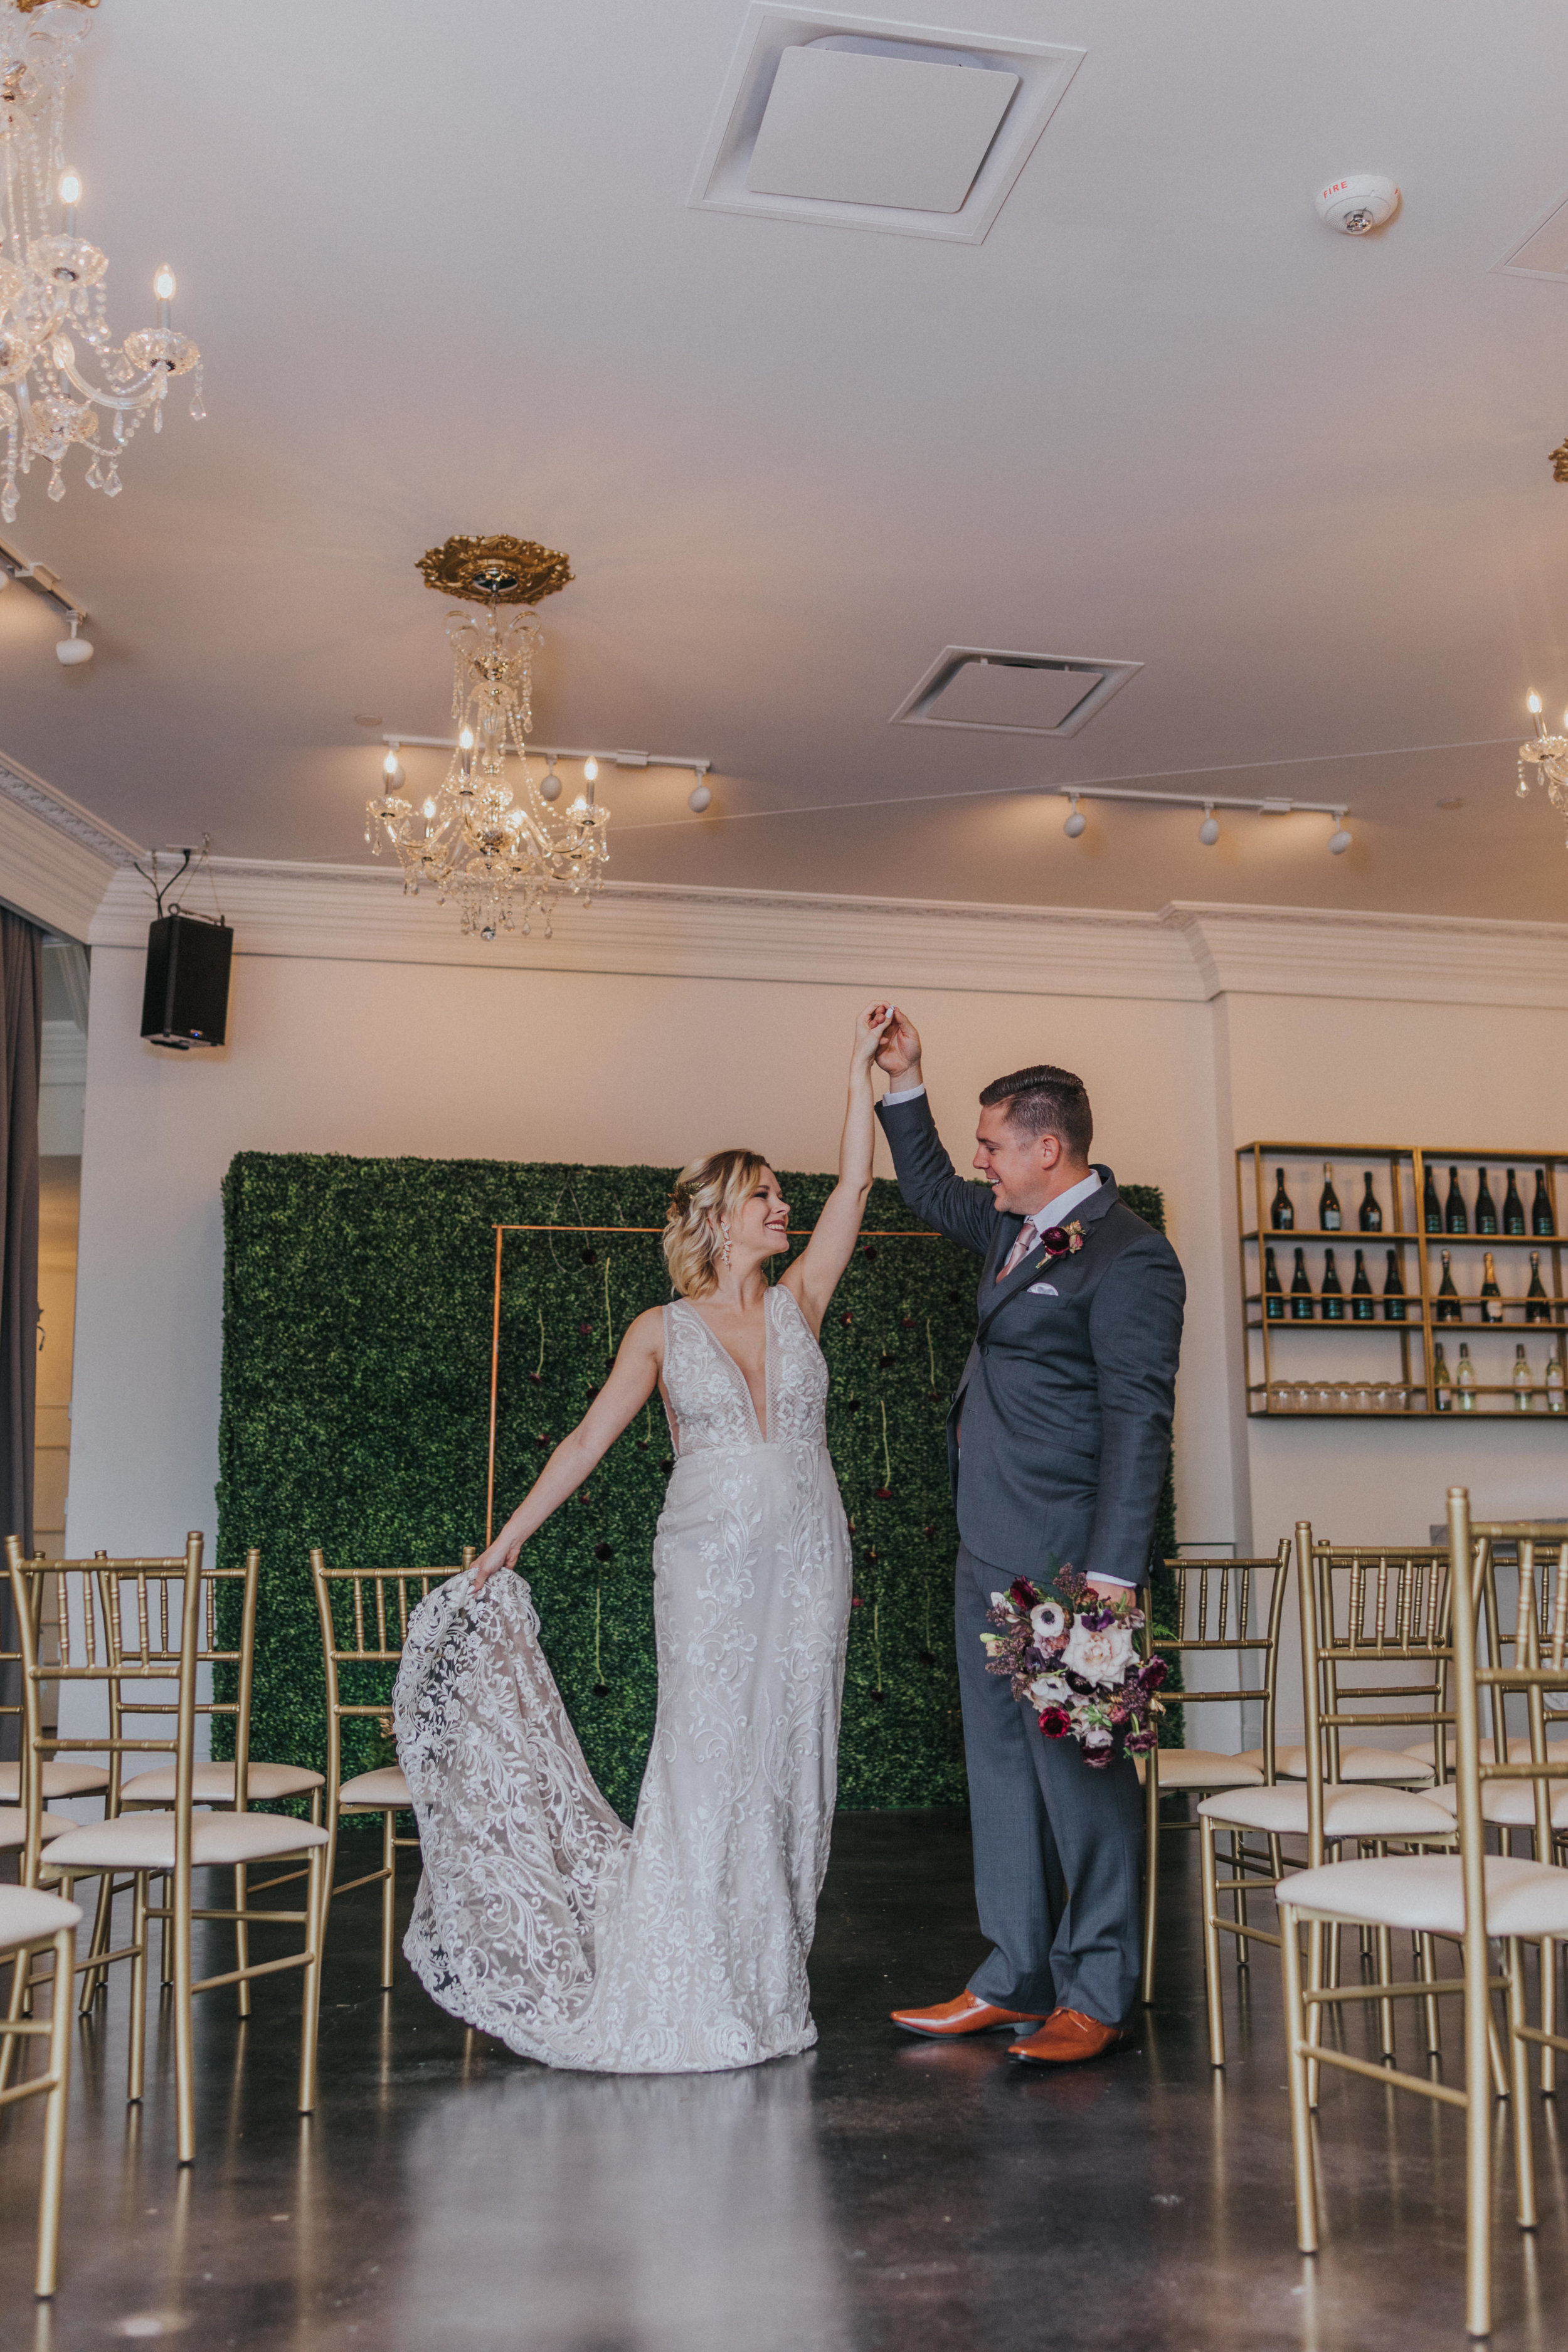 128 tiny-luxe-weddings-omaha-nebraska-midwest-empire-room.jpg